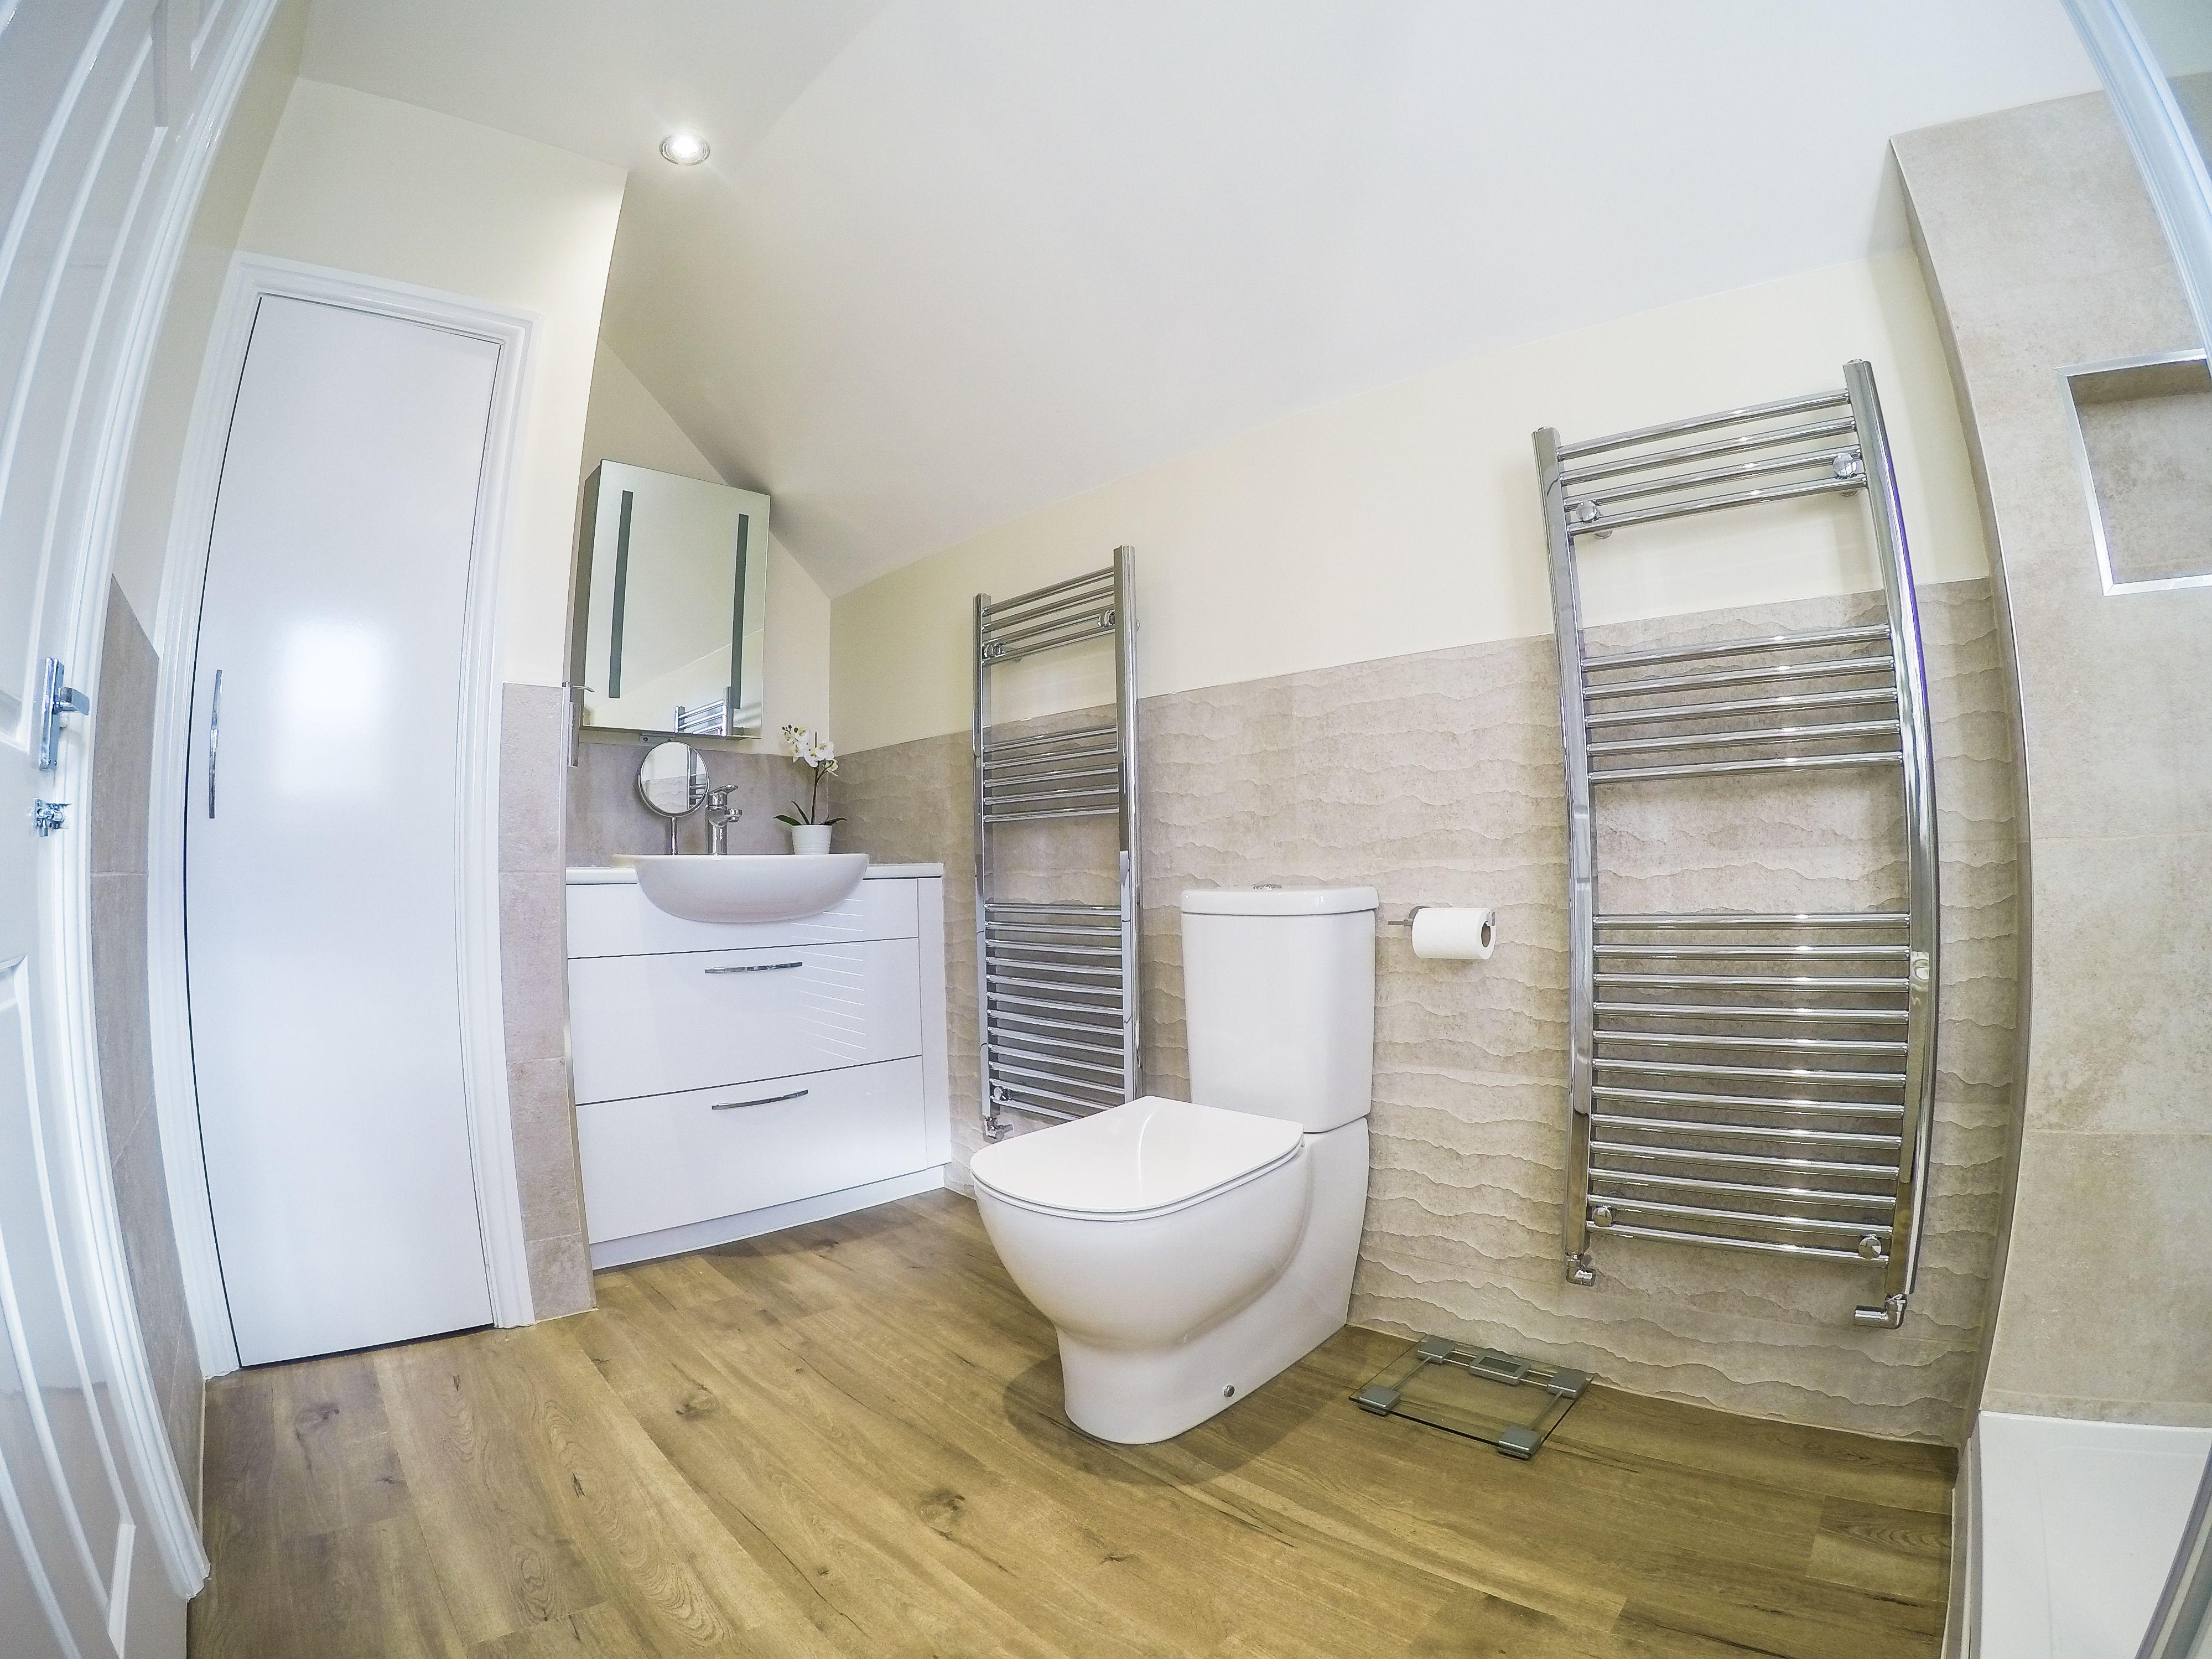 Porcelanosa Contour Beige Ideal Standard Tessi Close Coupled Wc Tile Bathroom Bathroom Toilet